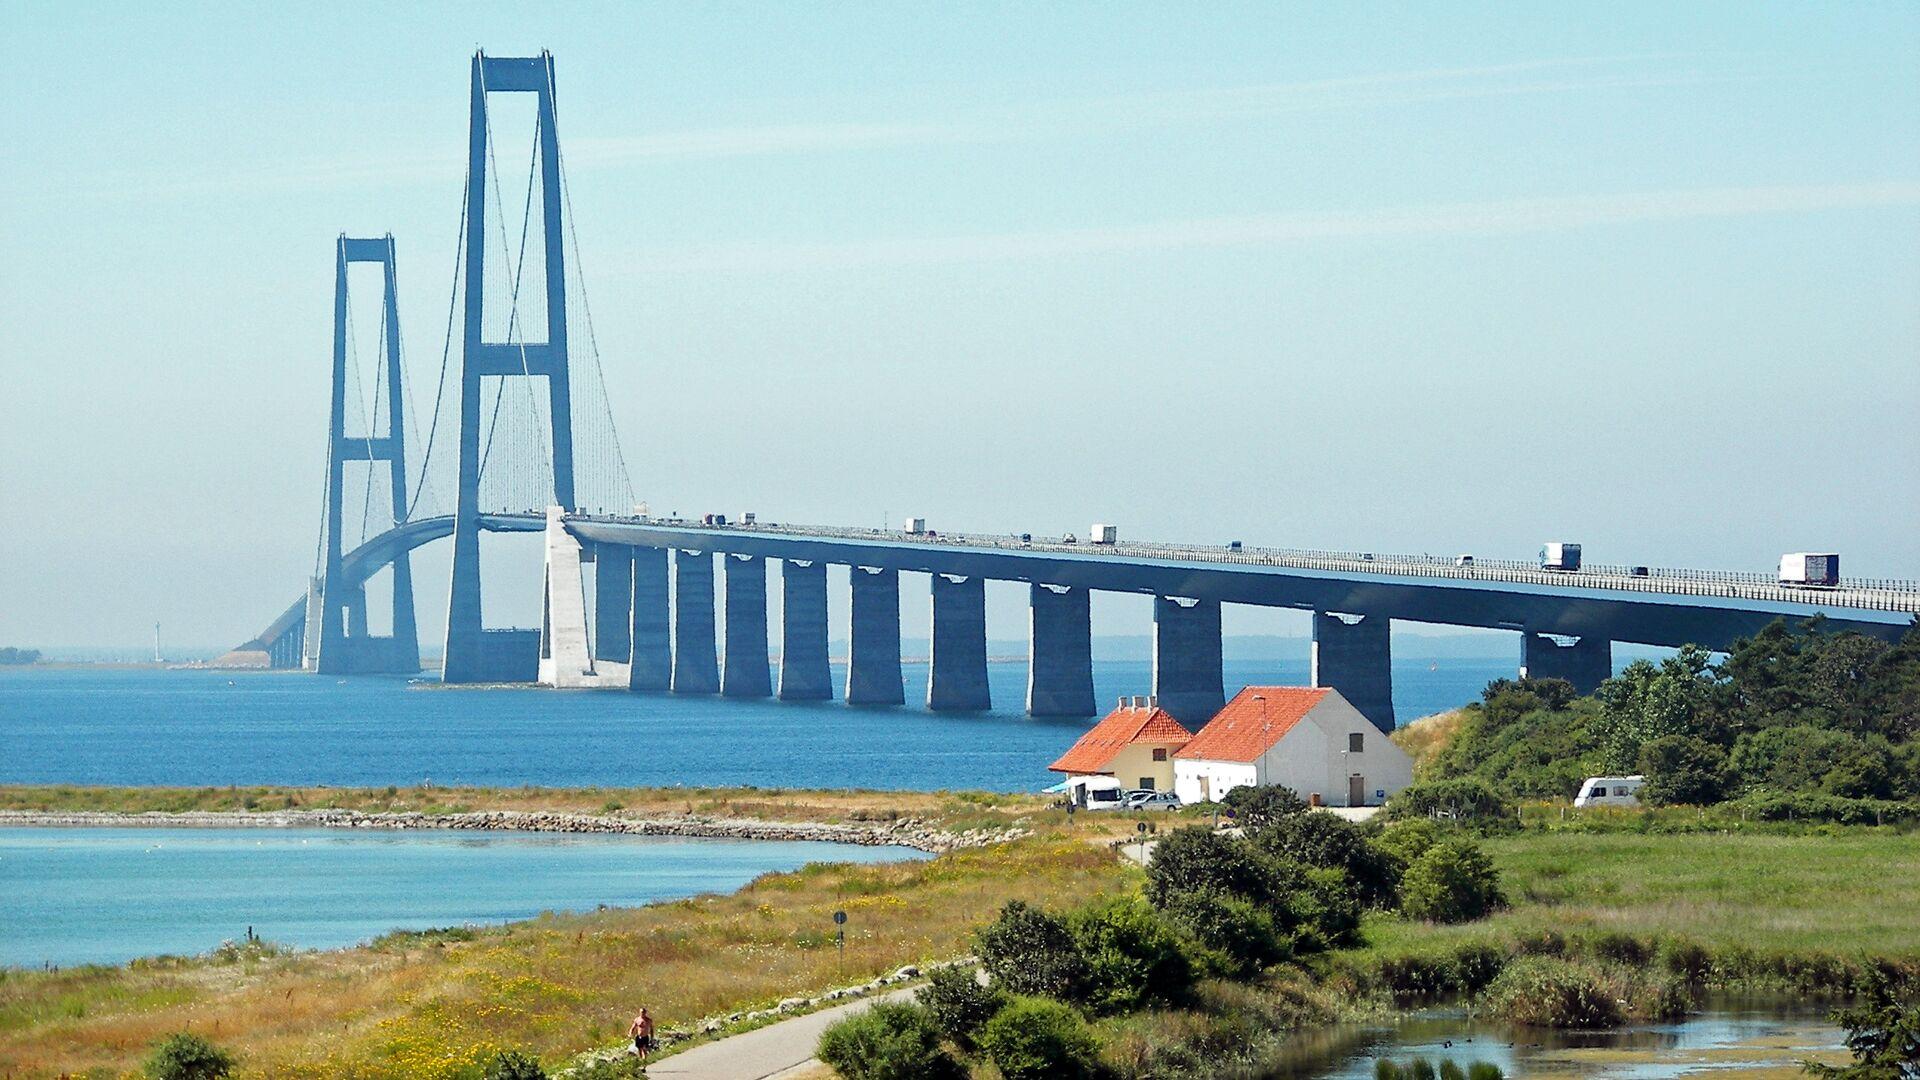 Il Ponte del Grande Belt, Danimarca - Sputnik Italia, 1920, 24.09.2021